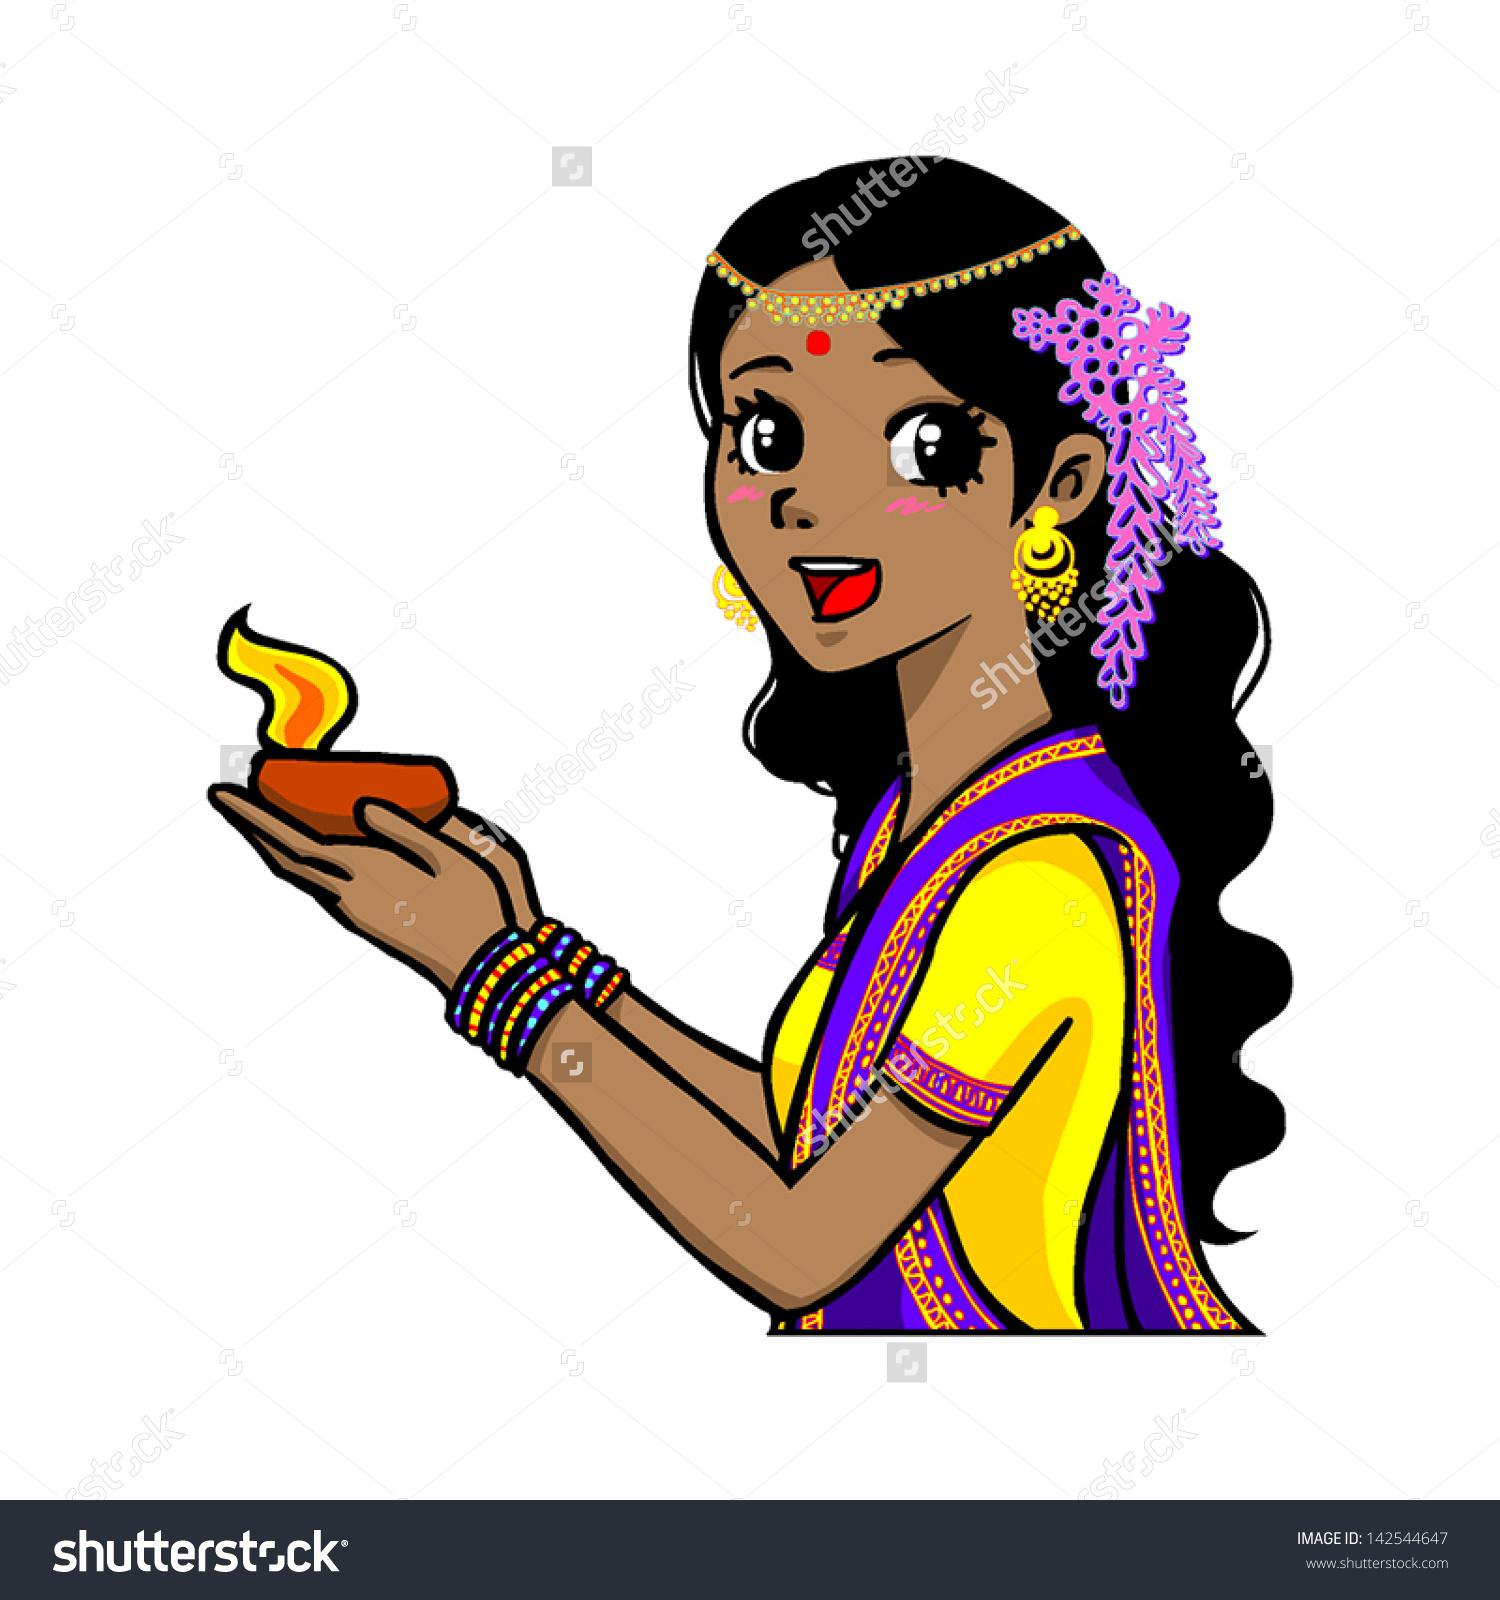 Deepavali Dawali Vector Drawing Cute Indian Stock Vector 142544647.